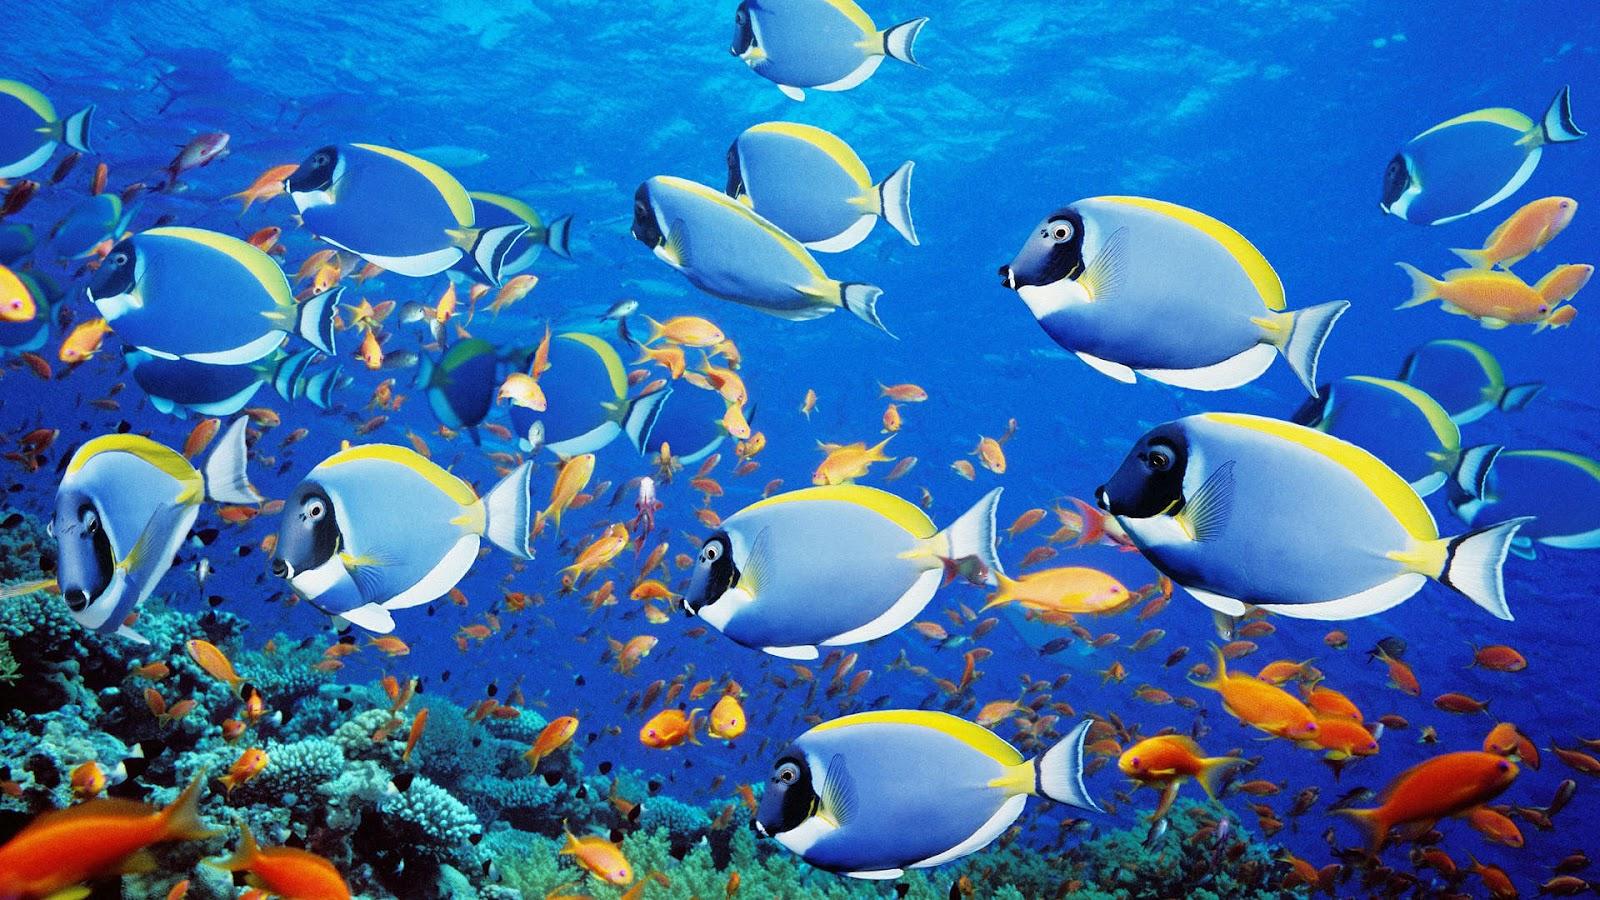 Beautiful Fish Wallpapers Free Download - HD Wallpapers Pop